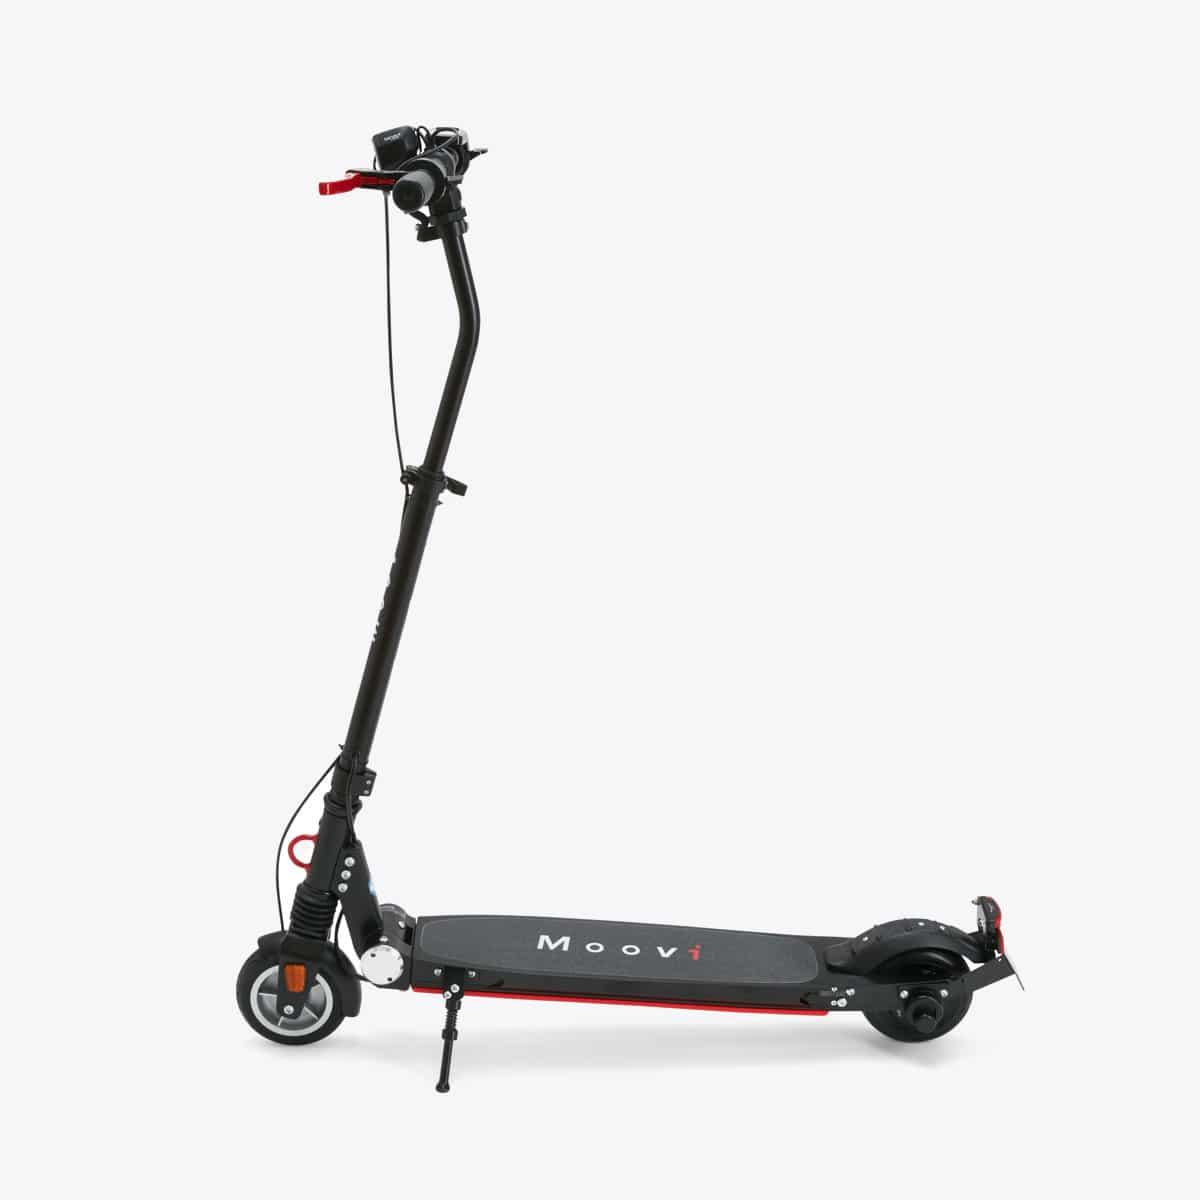 moovi-escooter-stvo-strassenzulassung-seite-staender